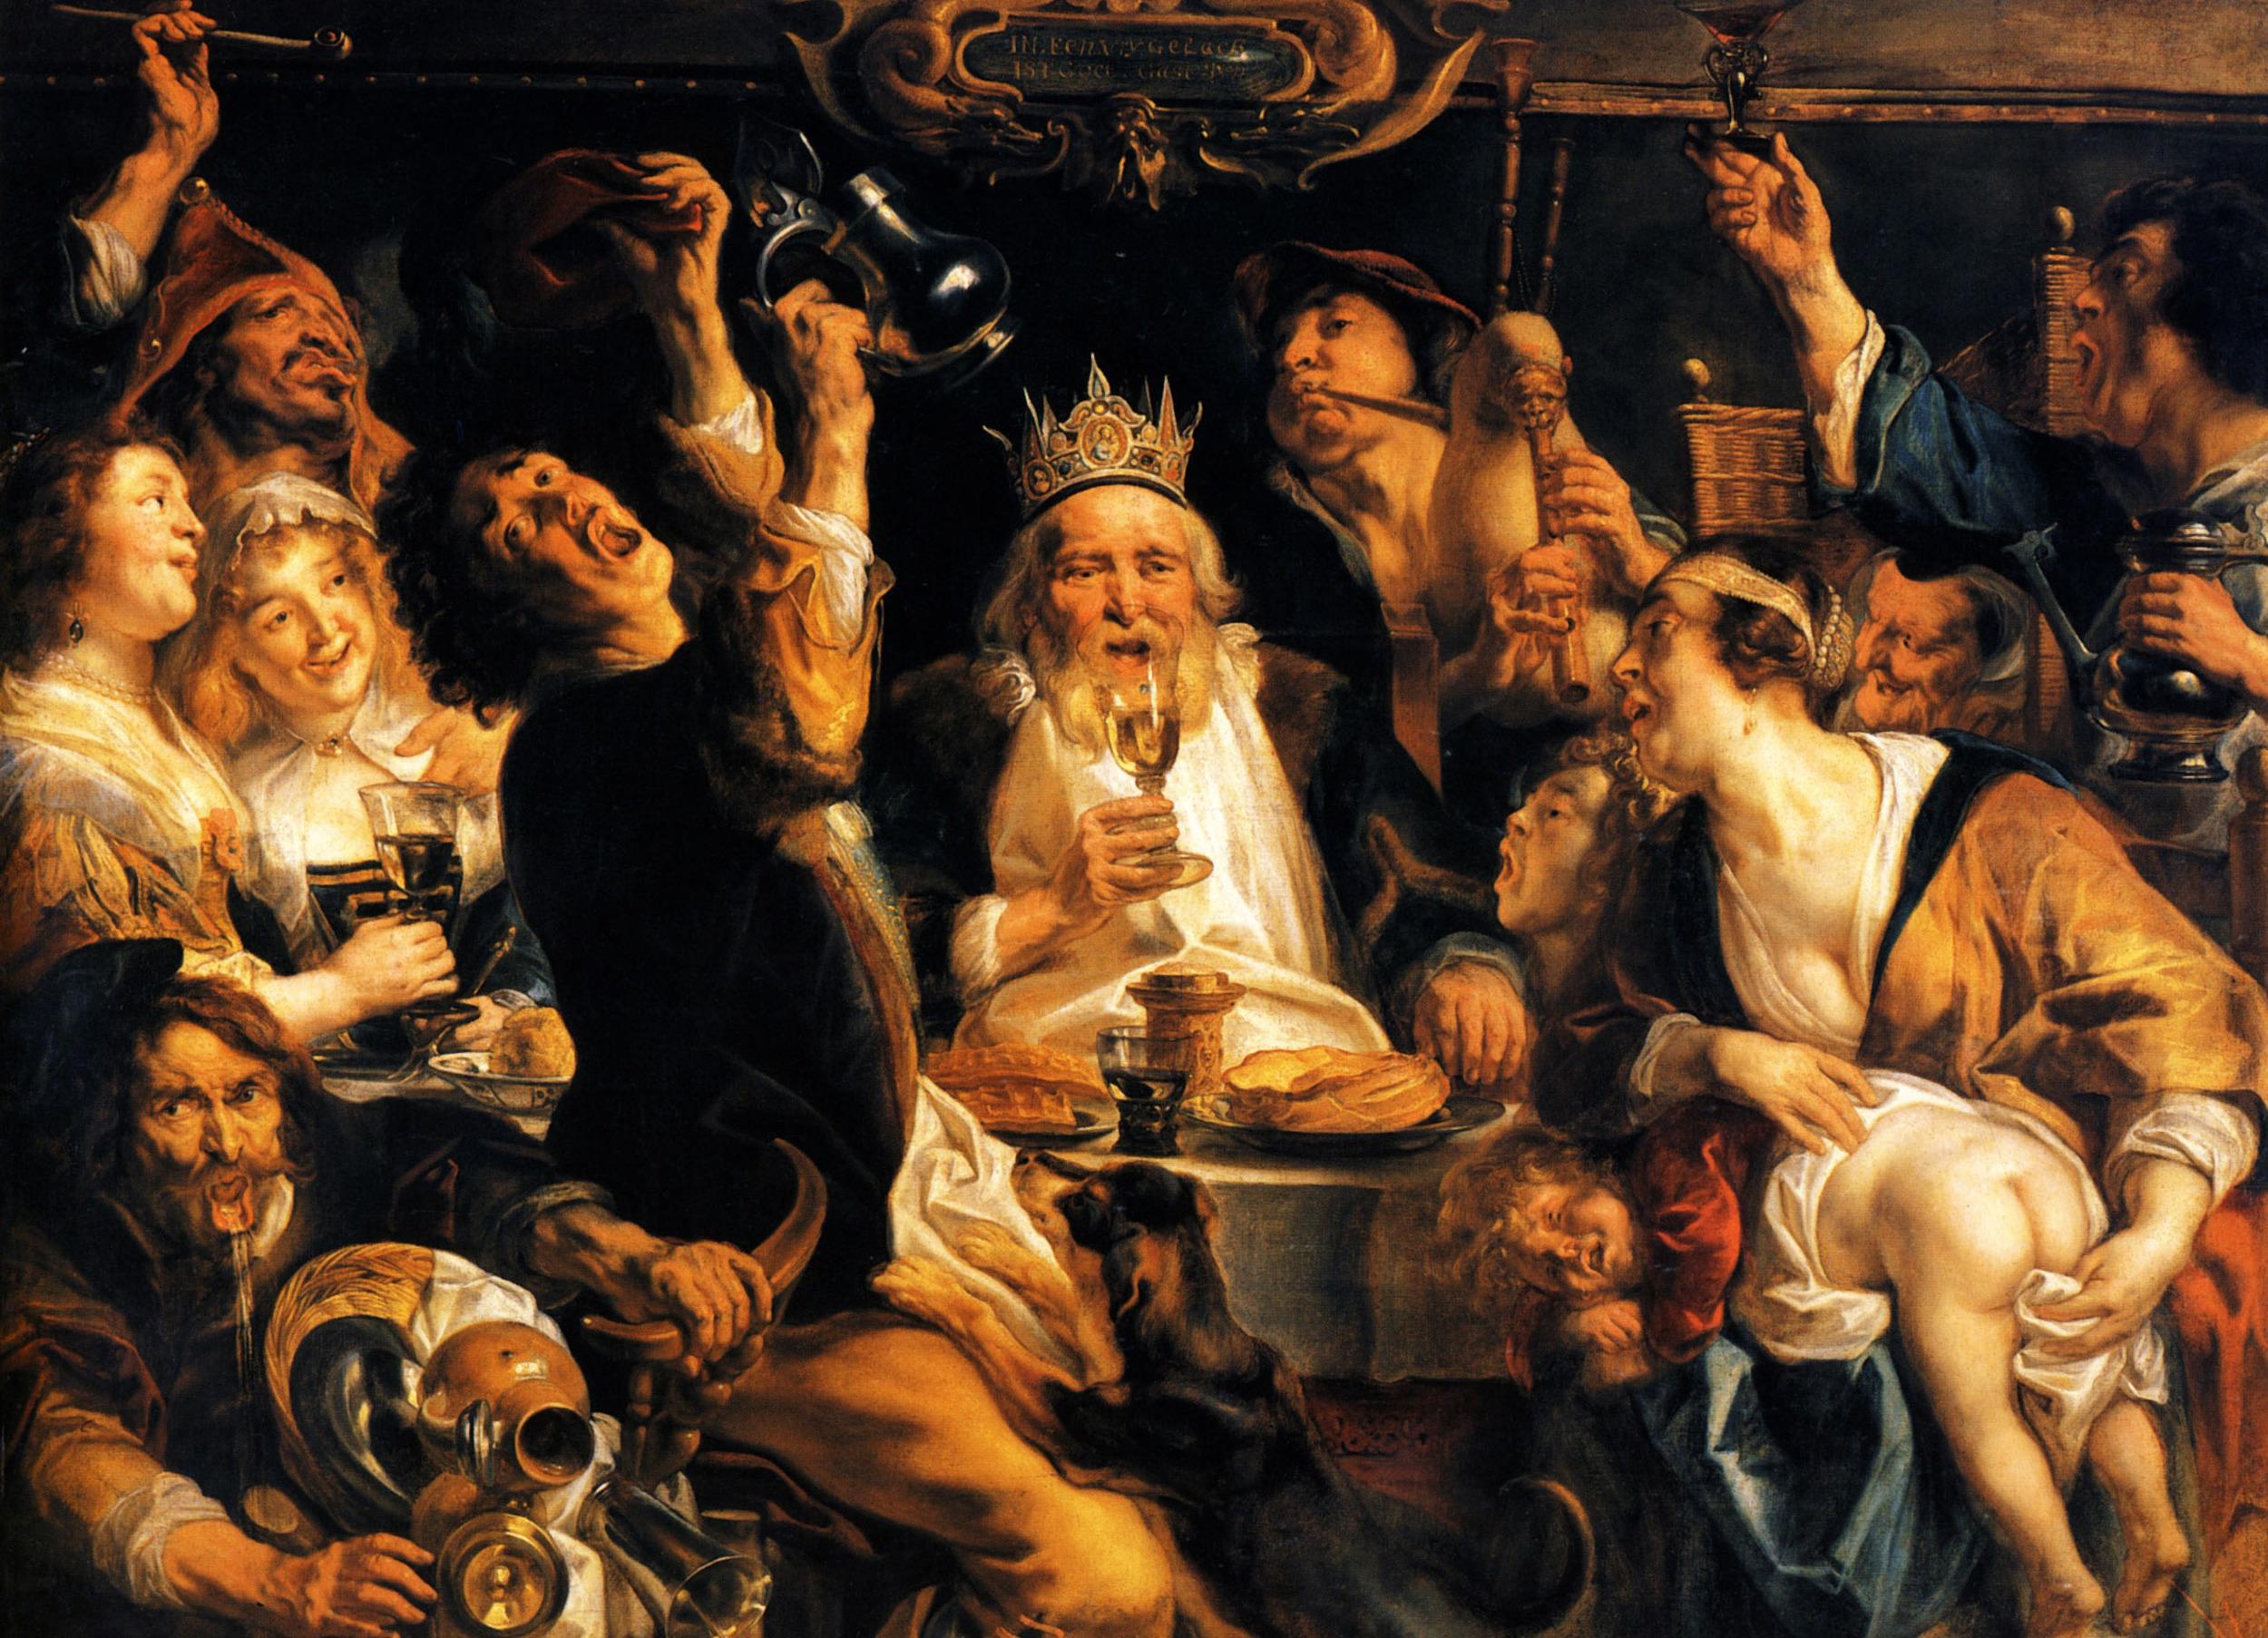 ... and Flemish folkways continue.  (Jacob Jordaens,  The King Drinks,  1640)